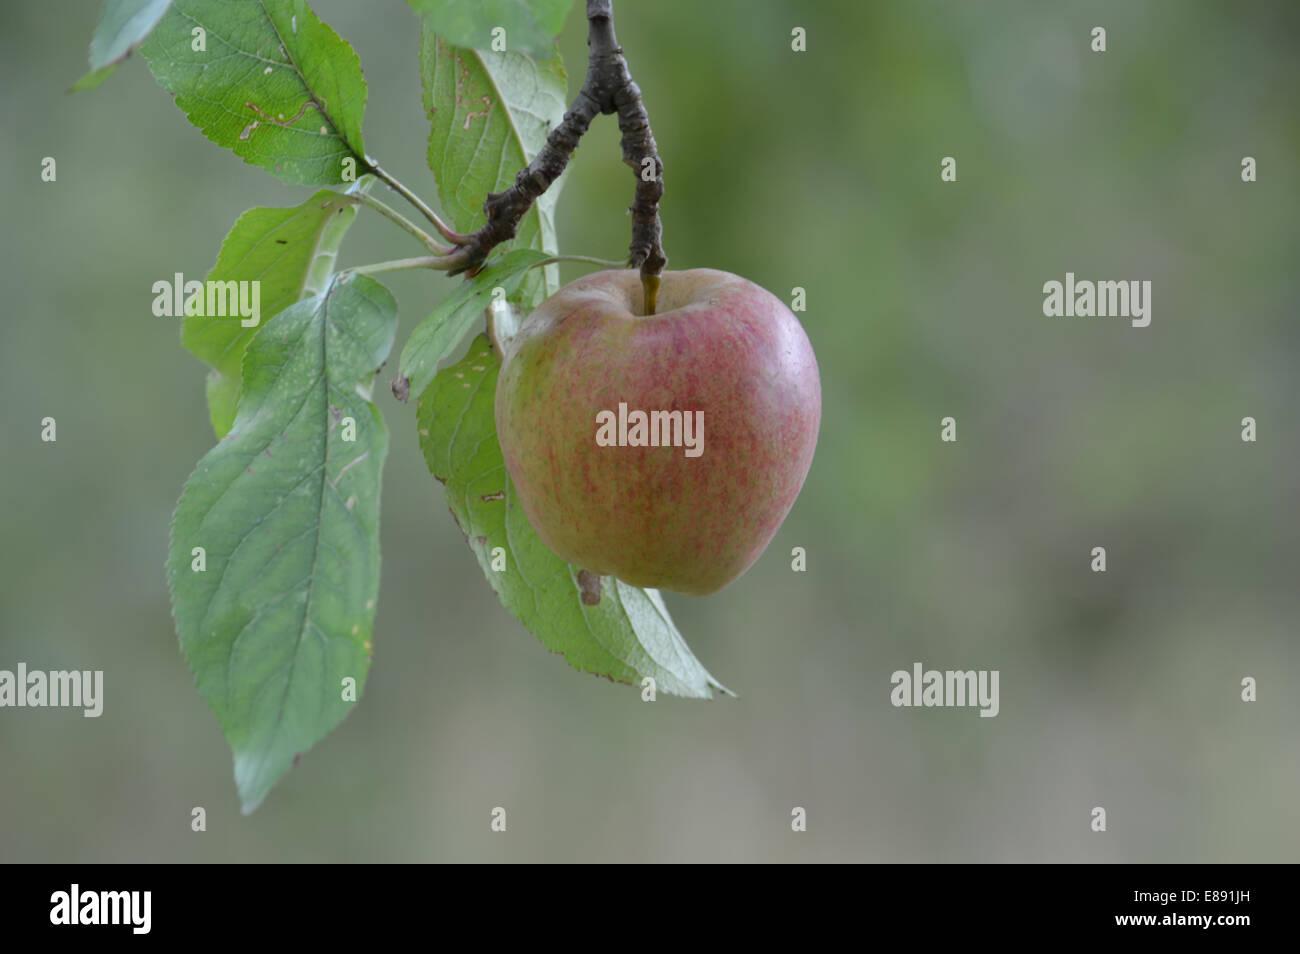 Apple hanging on twig - Stock Image